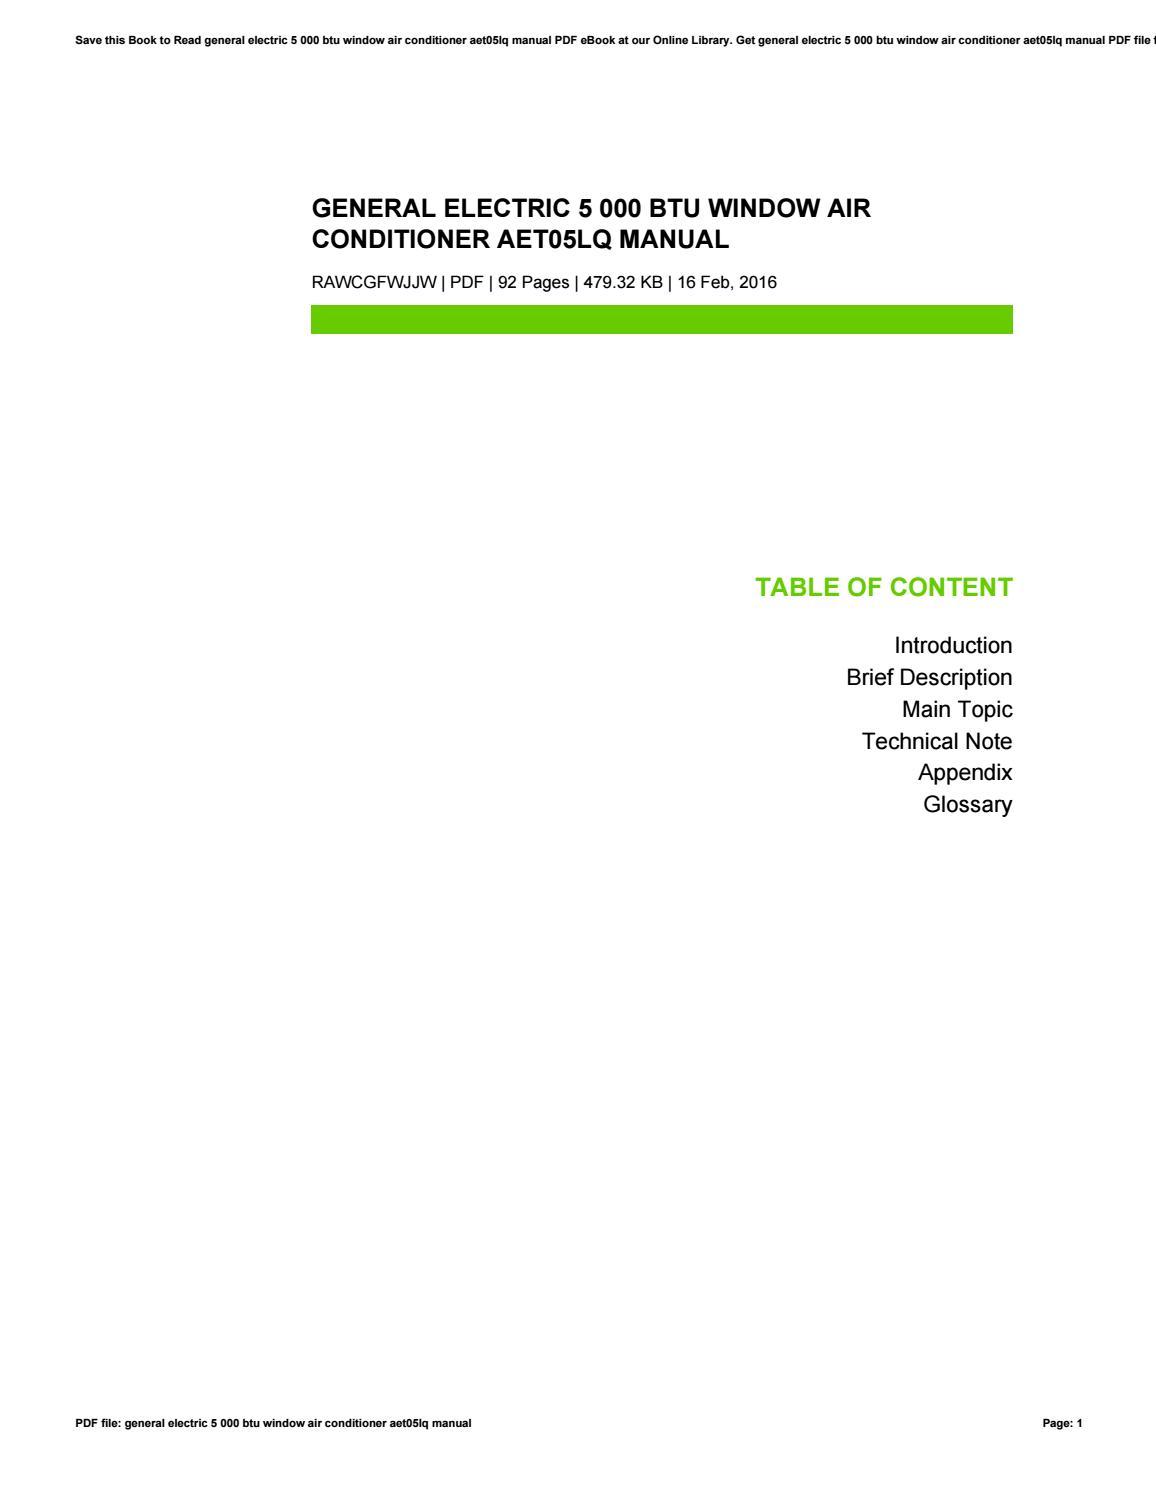 General electric 5 000 btu window air conditioner aet05lq manual by  JohnCaldera4058 - issuu